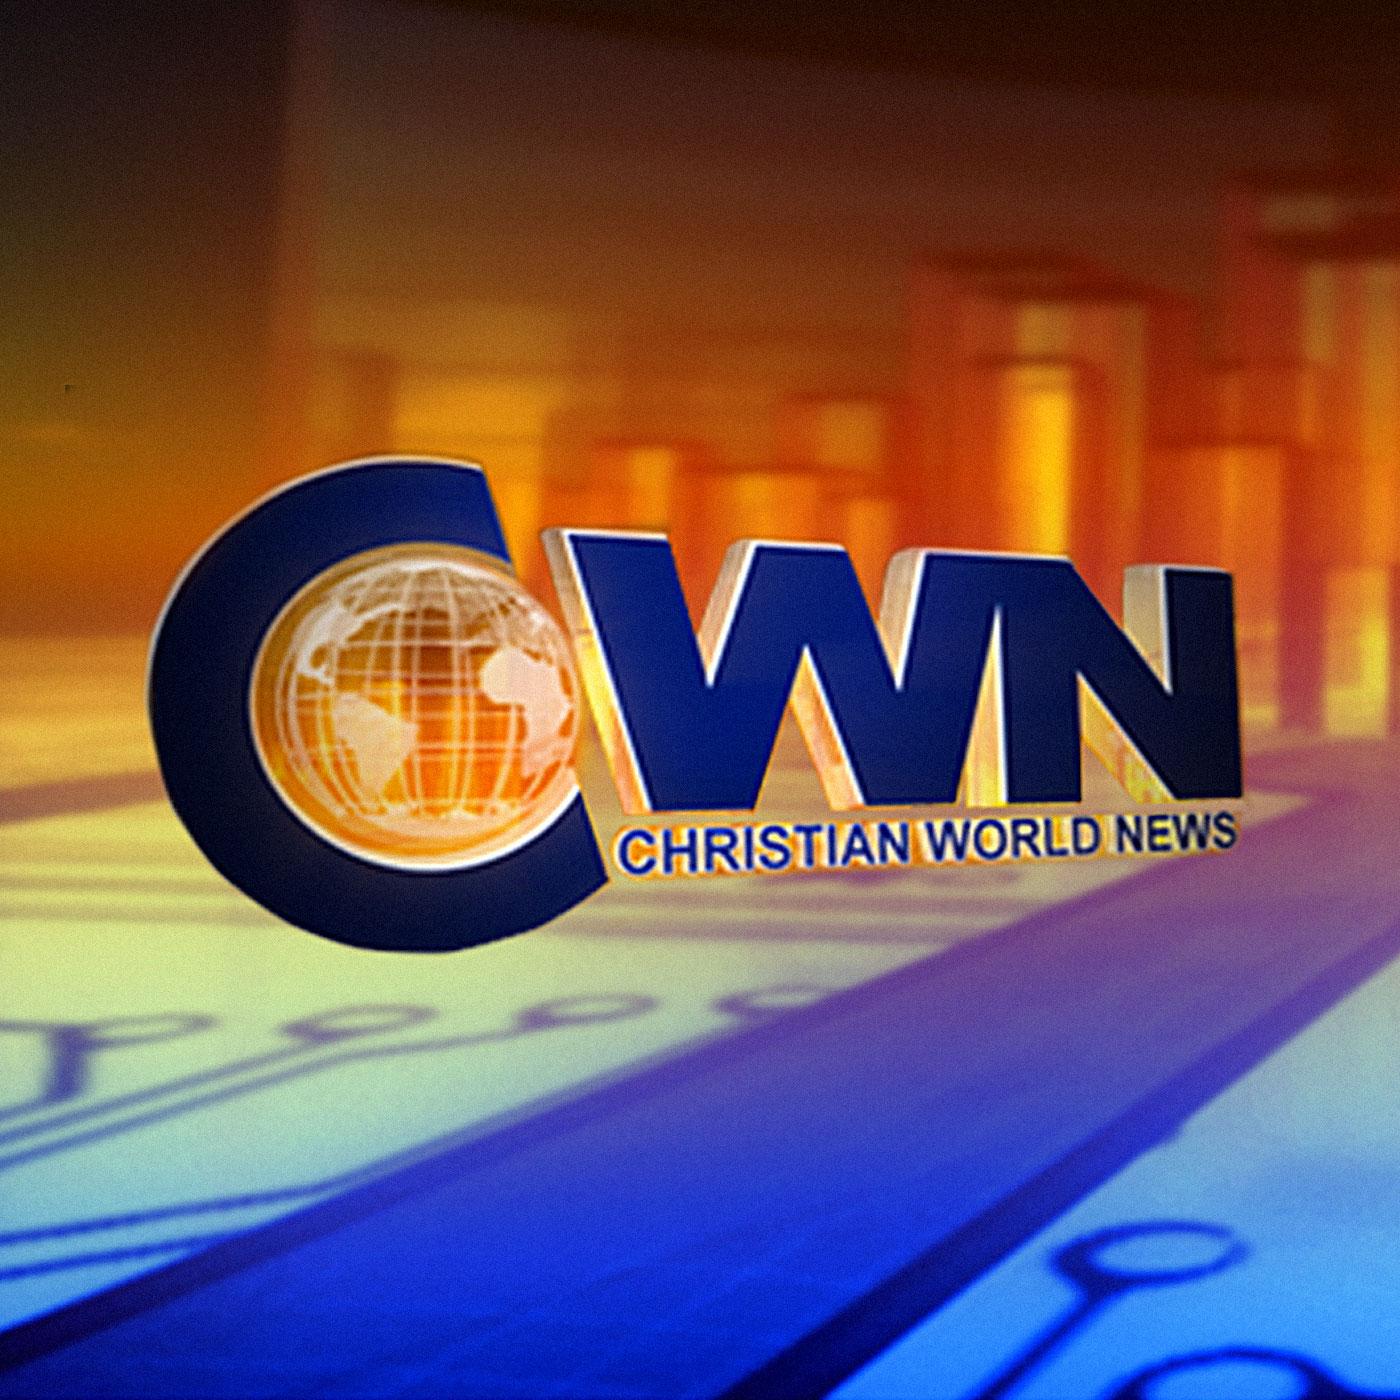 <![CDATA[CBN.com - Christian World News - Video Podcast]]>